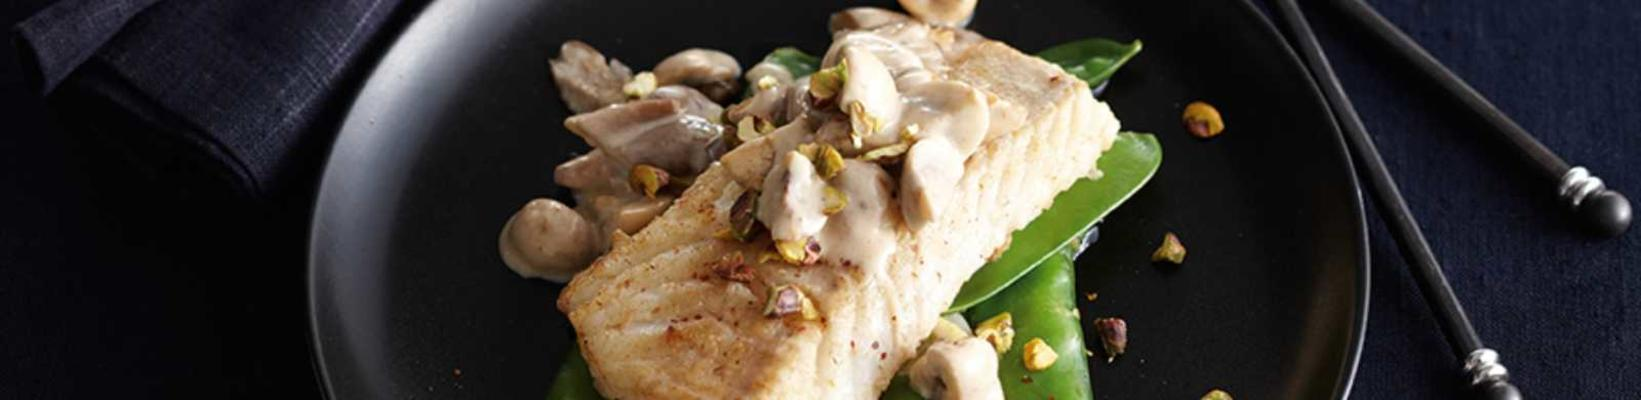 cod with mushrooms, snow peas and pistachio